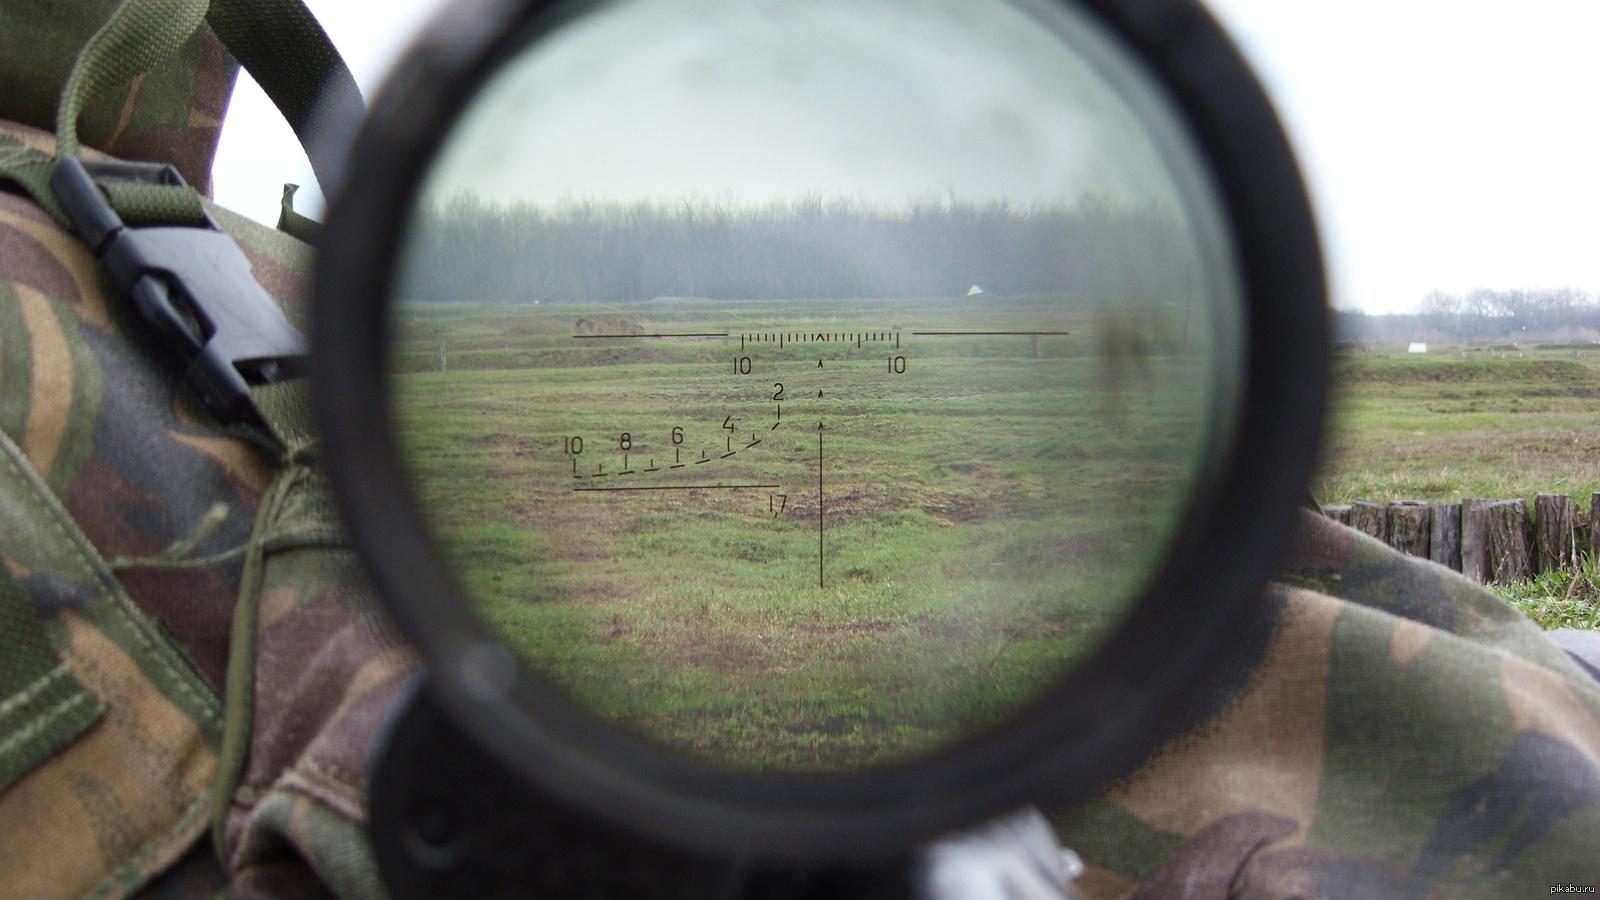 civilian killed by a sniper shot